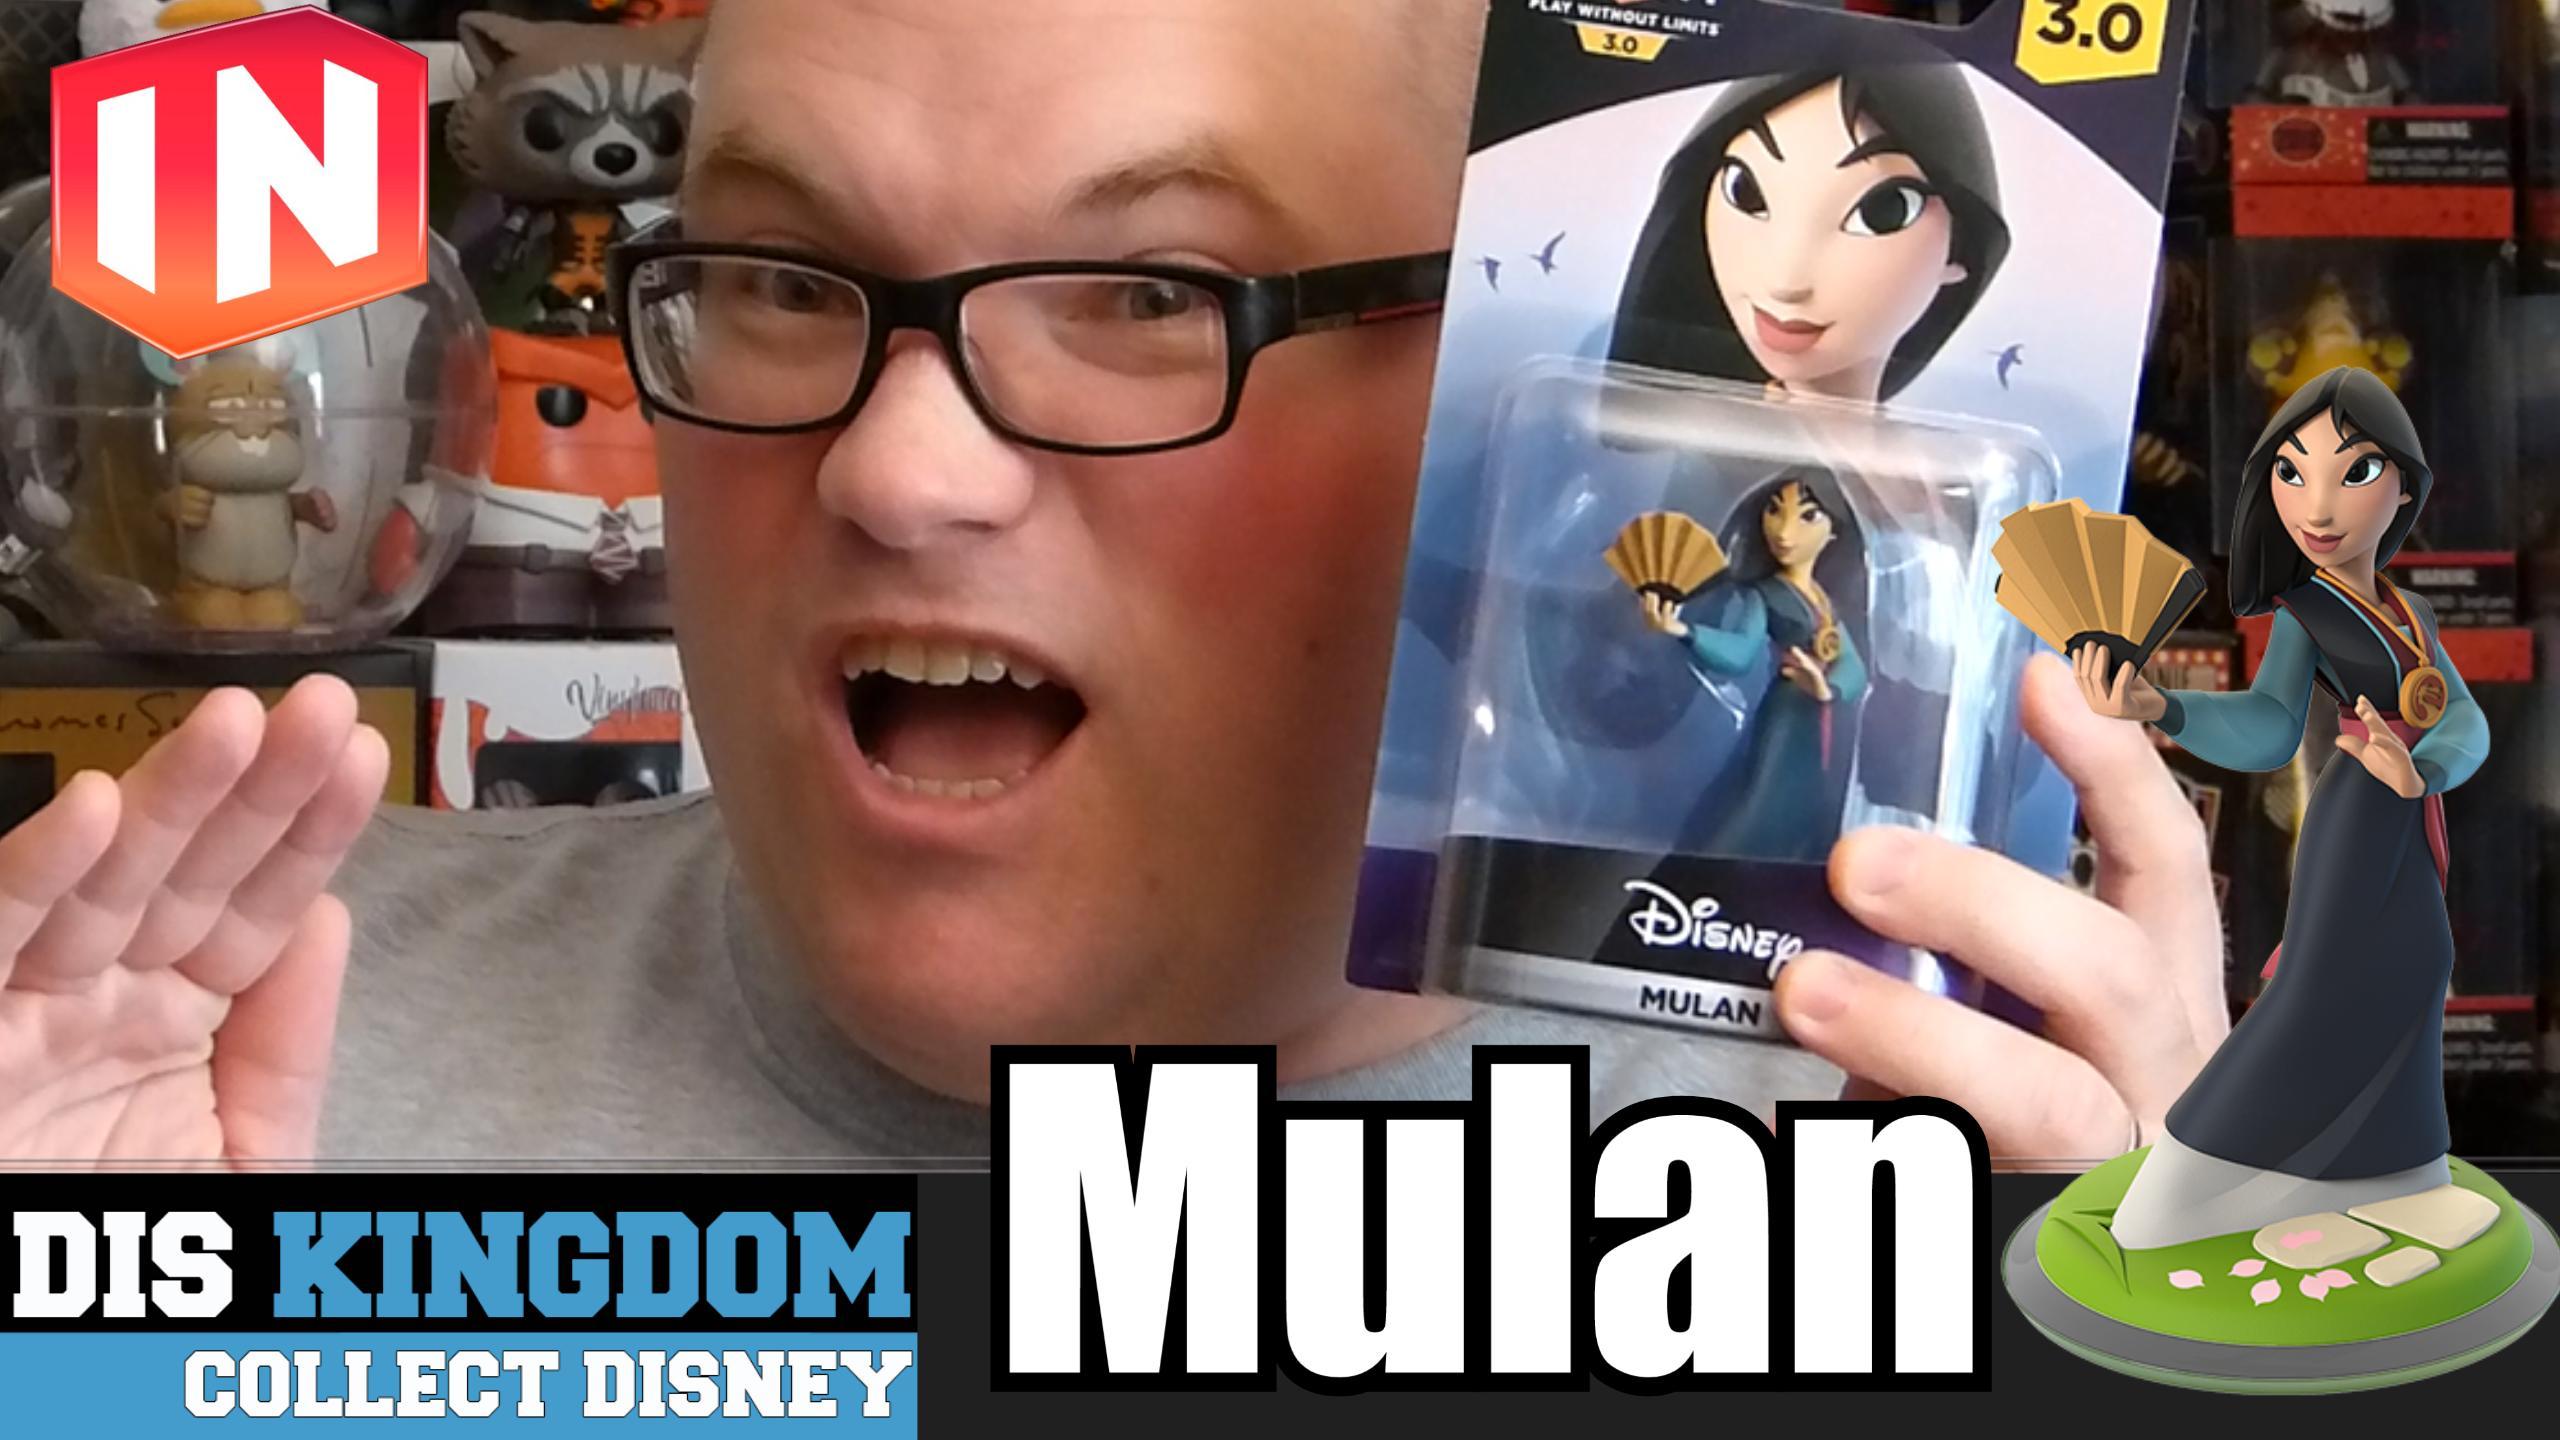 Disney Infinity 3.0 Mulan Unboxing